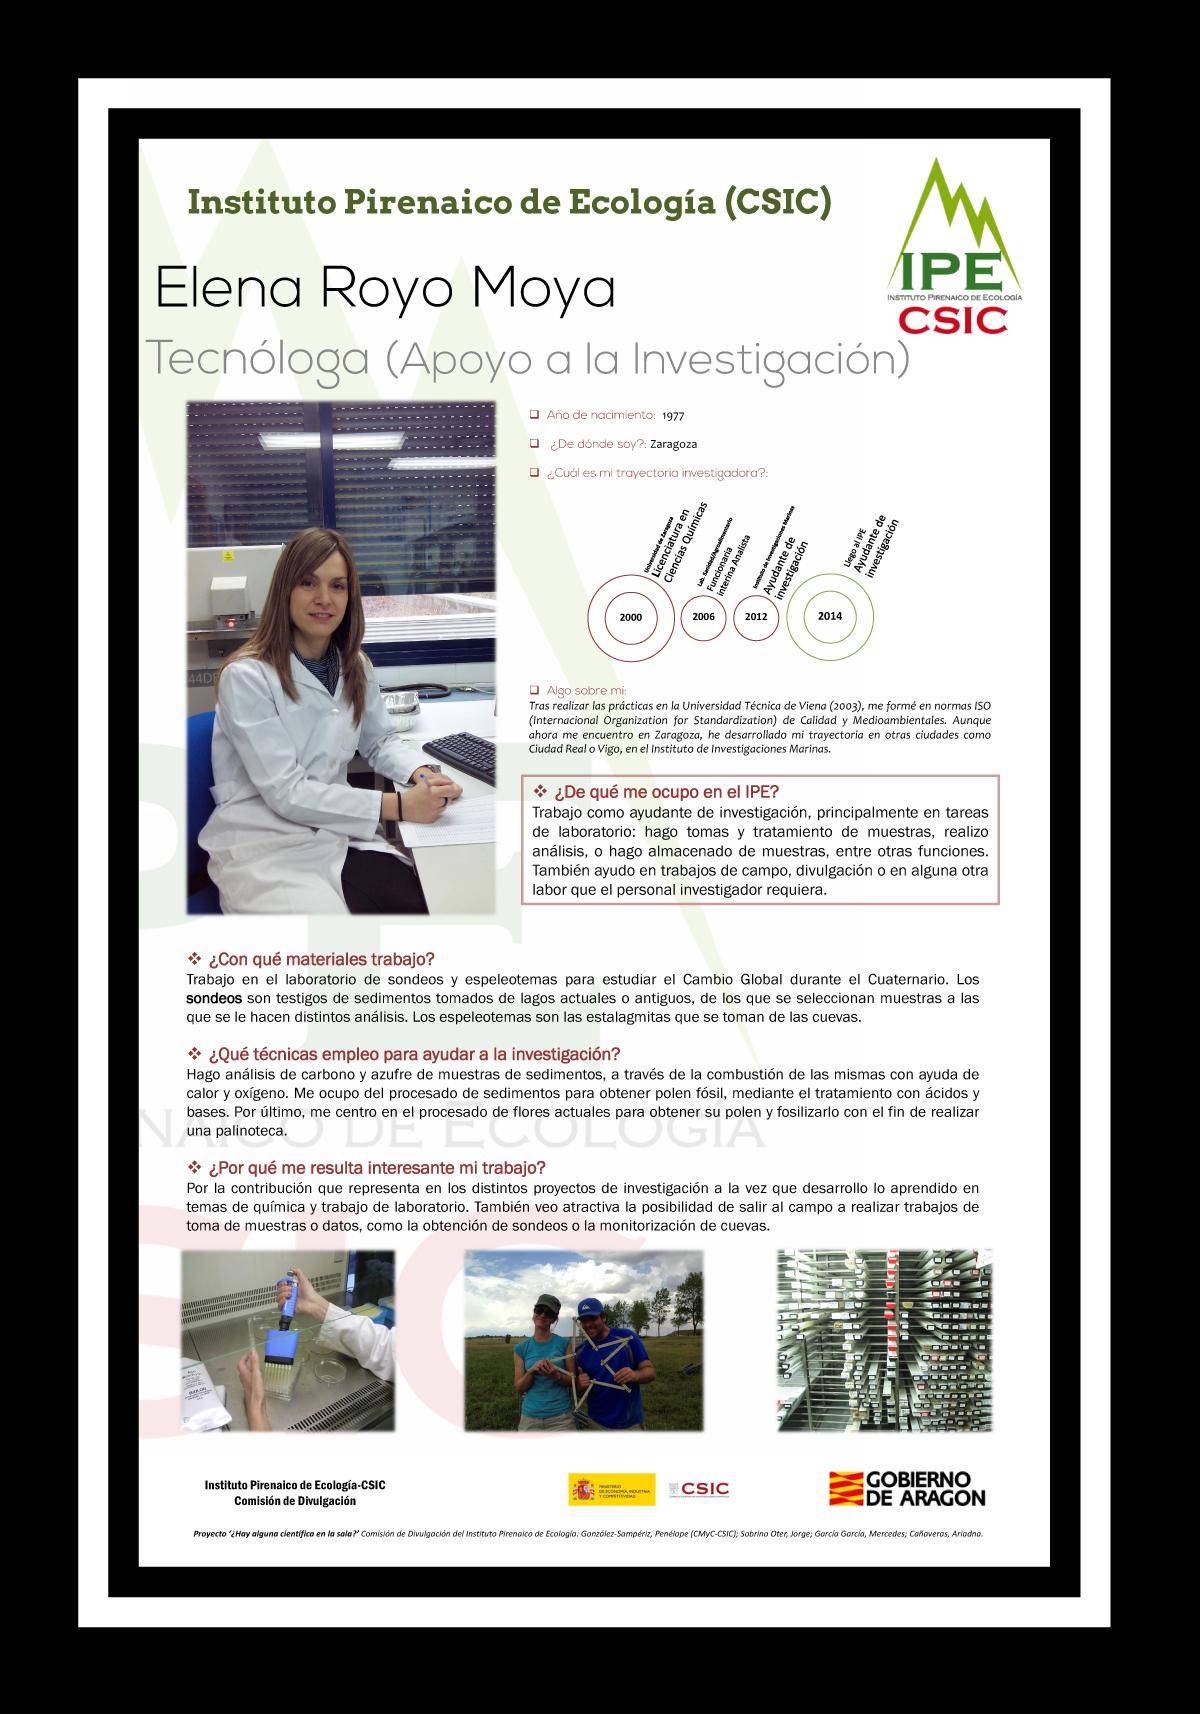 Elena Royo Moya